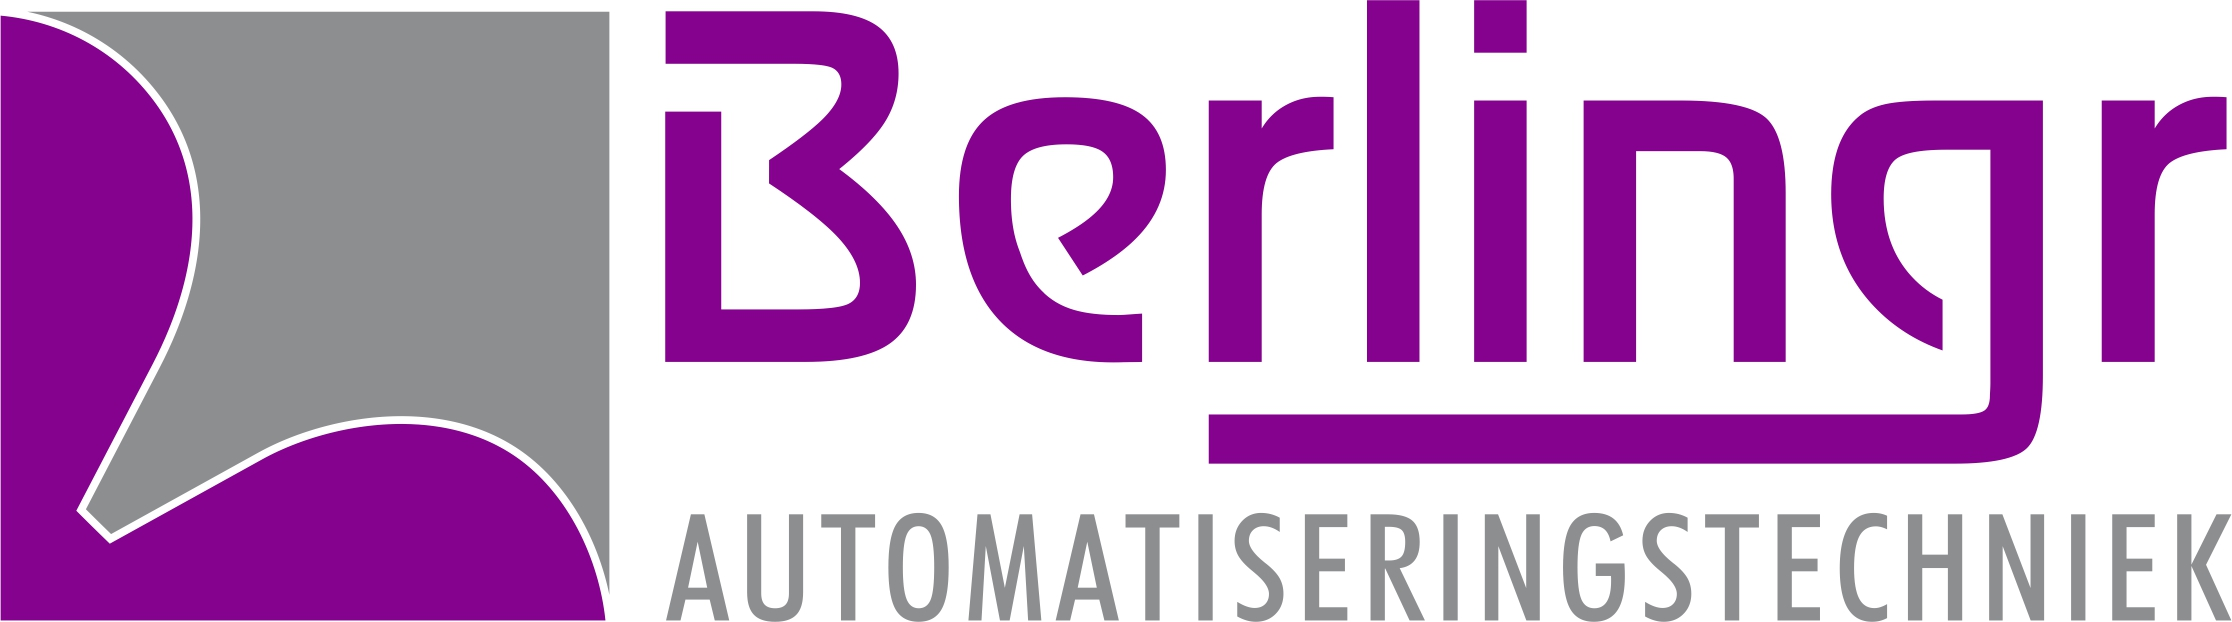 Berlingr Automatiseringstechniek BV